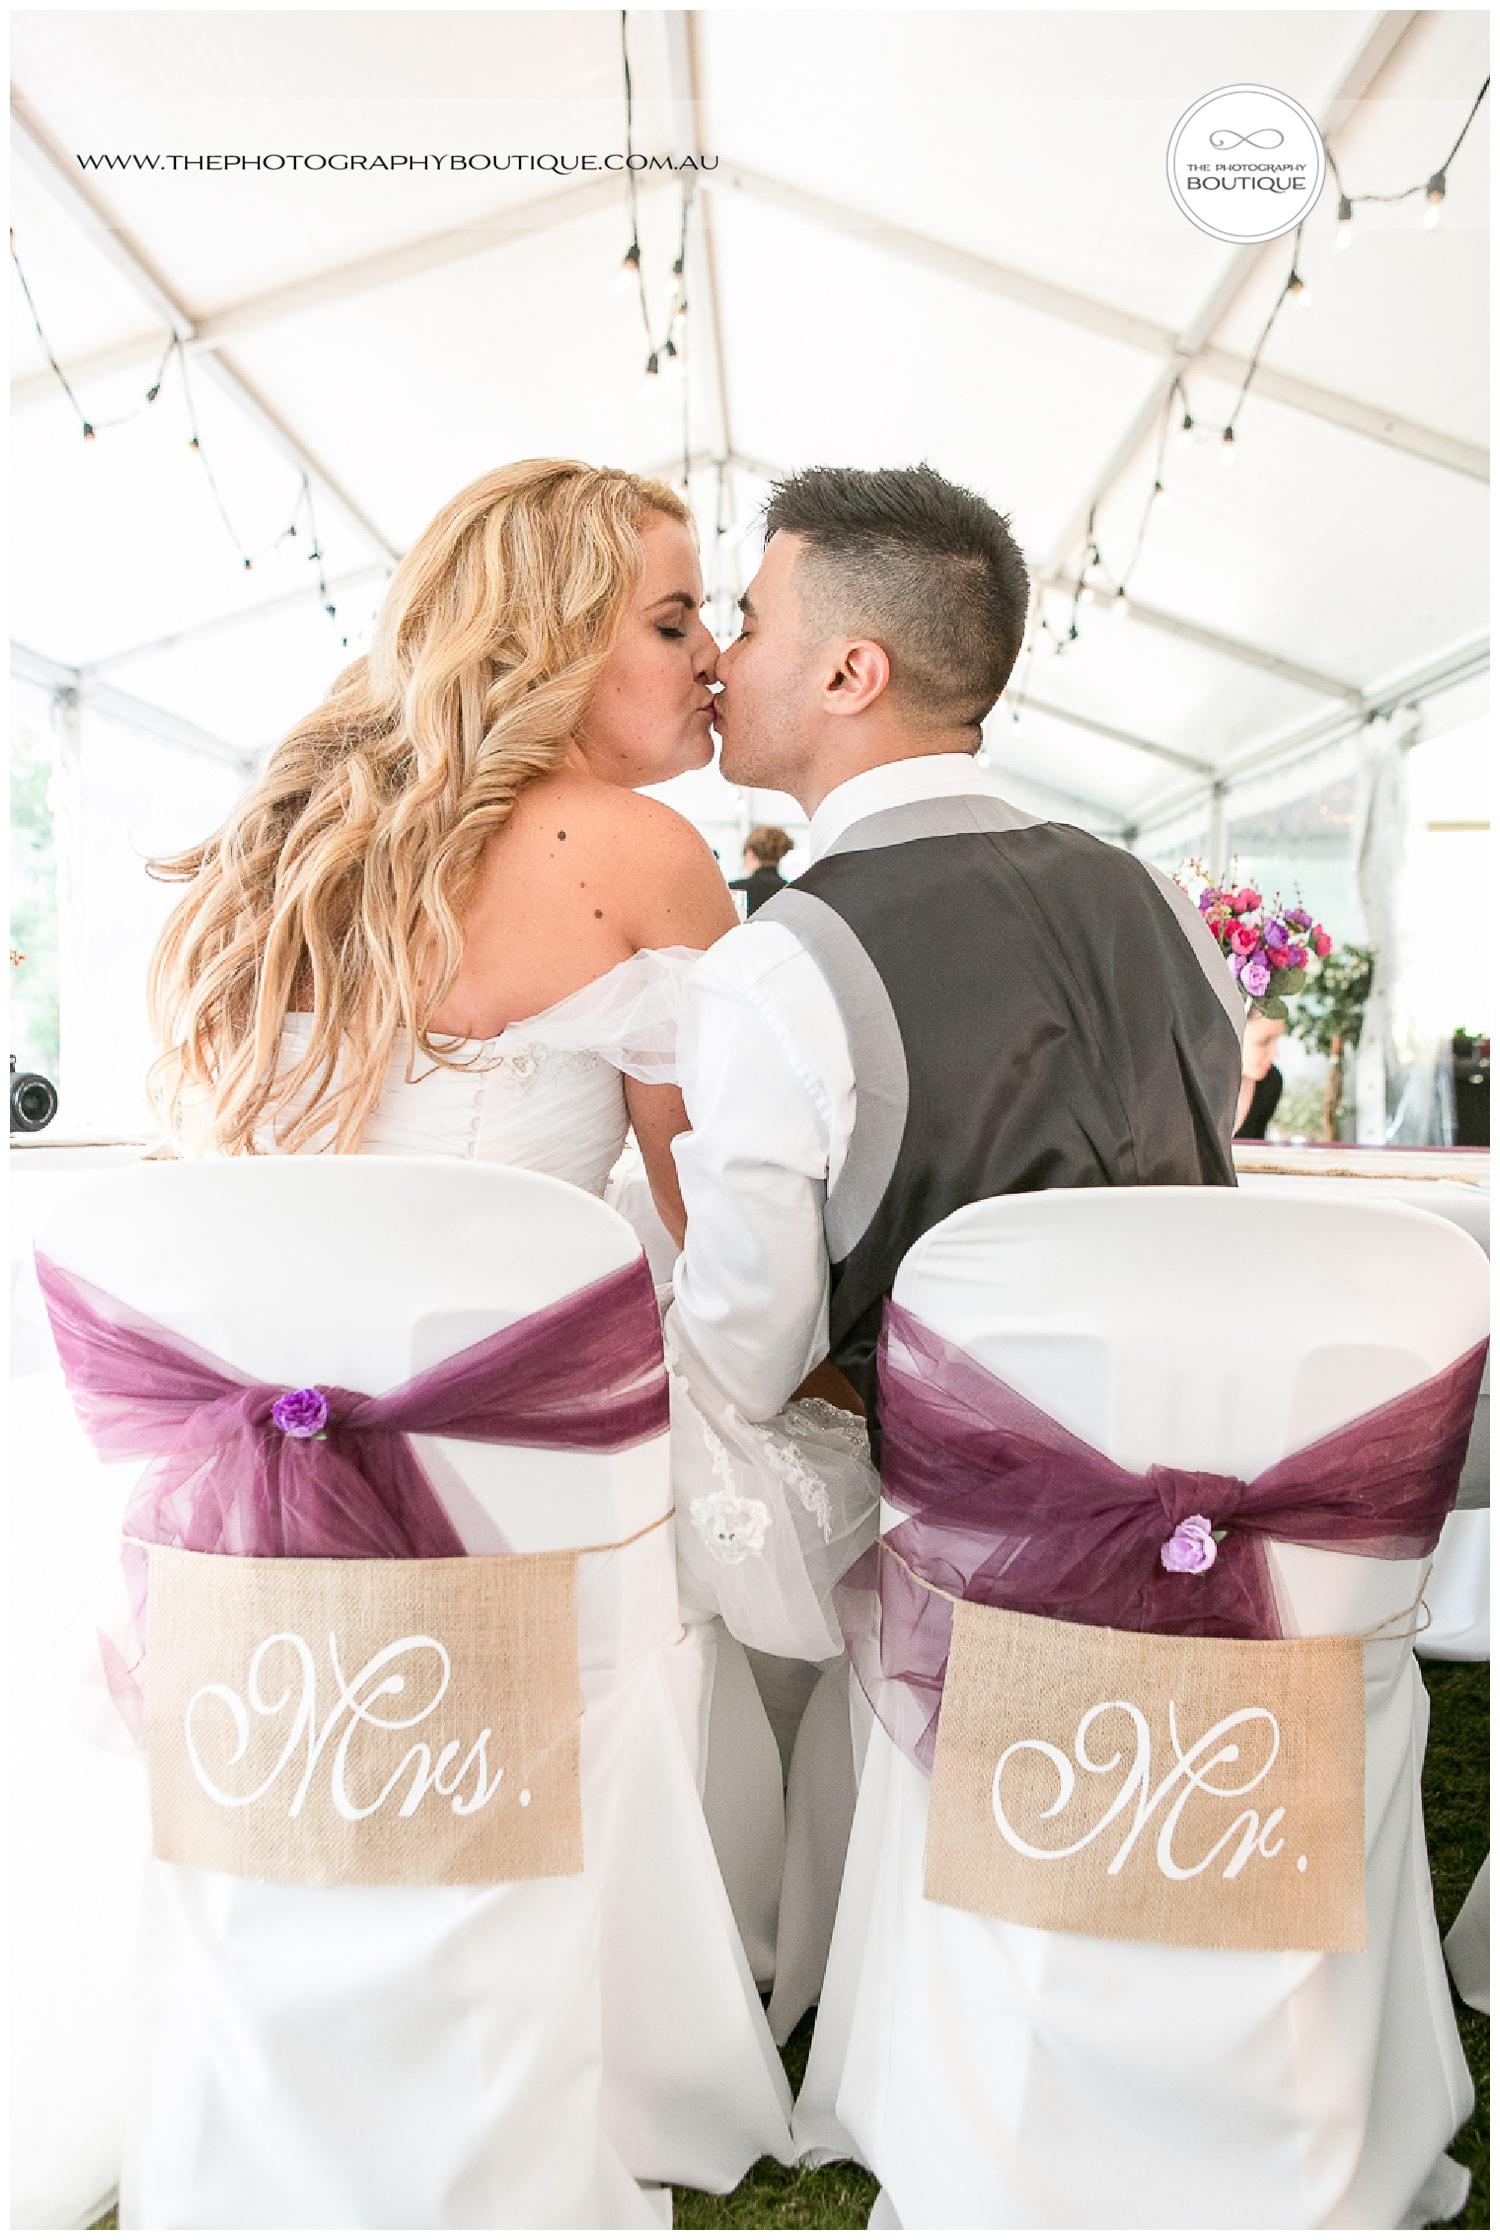 Mr and Mrs kissing at Roelands Bunbury wedding